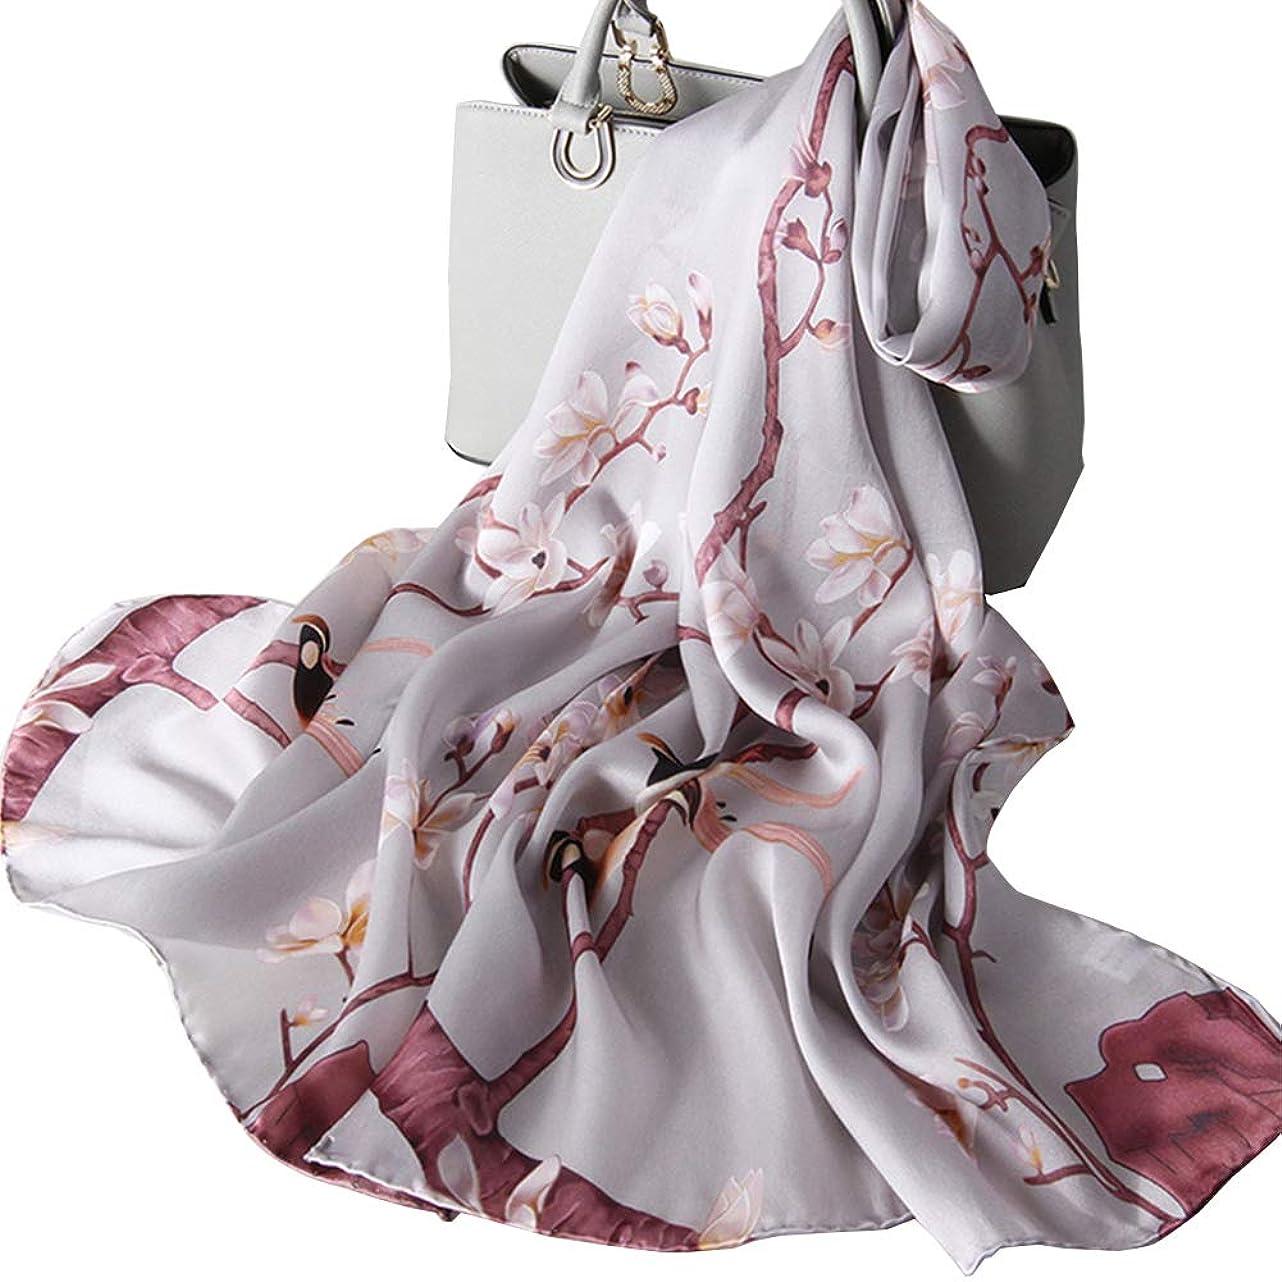 DANA XU Women's Silk Scarf Fashion Sunscreen Shawls Wraps for Headscarf Neck yzv766541842414